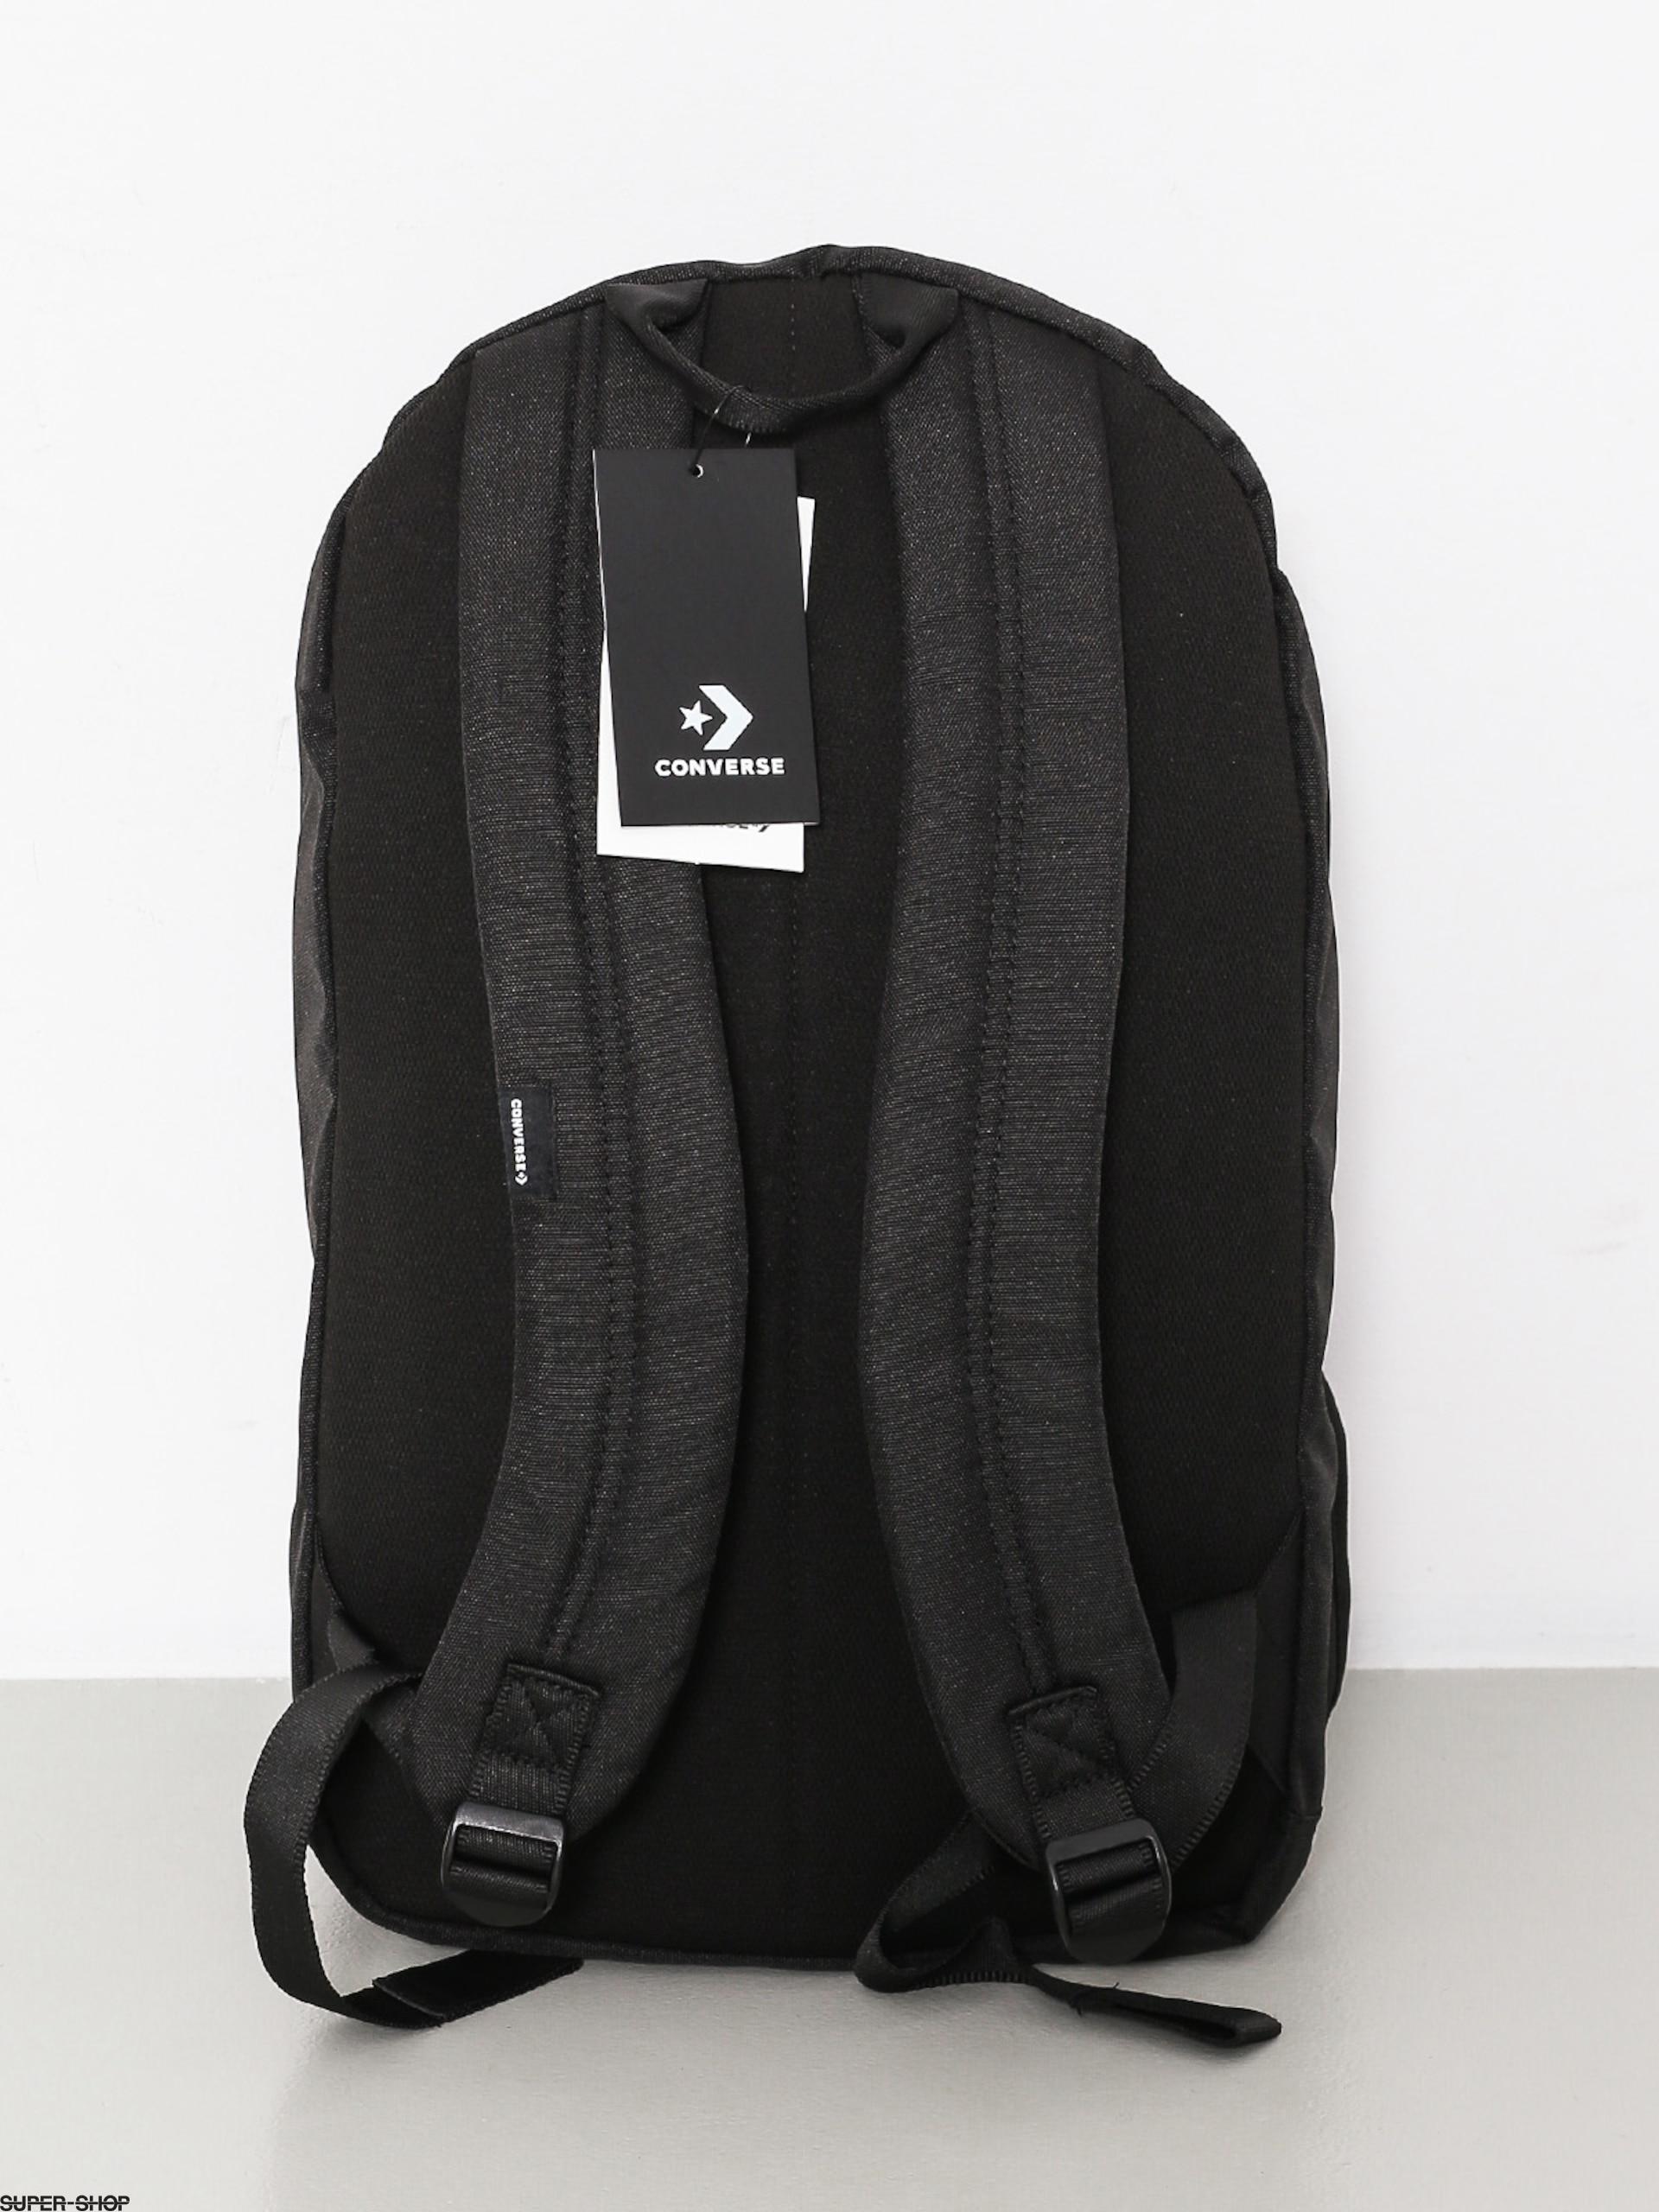 e631f6ec91d8 Converse Backpack Edc 22 (converse black white)